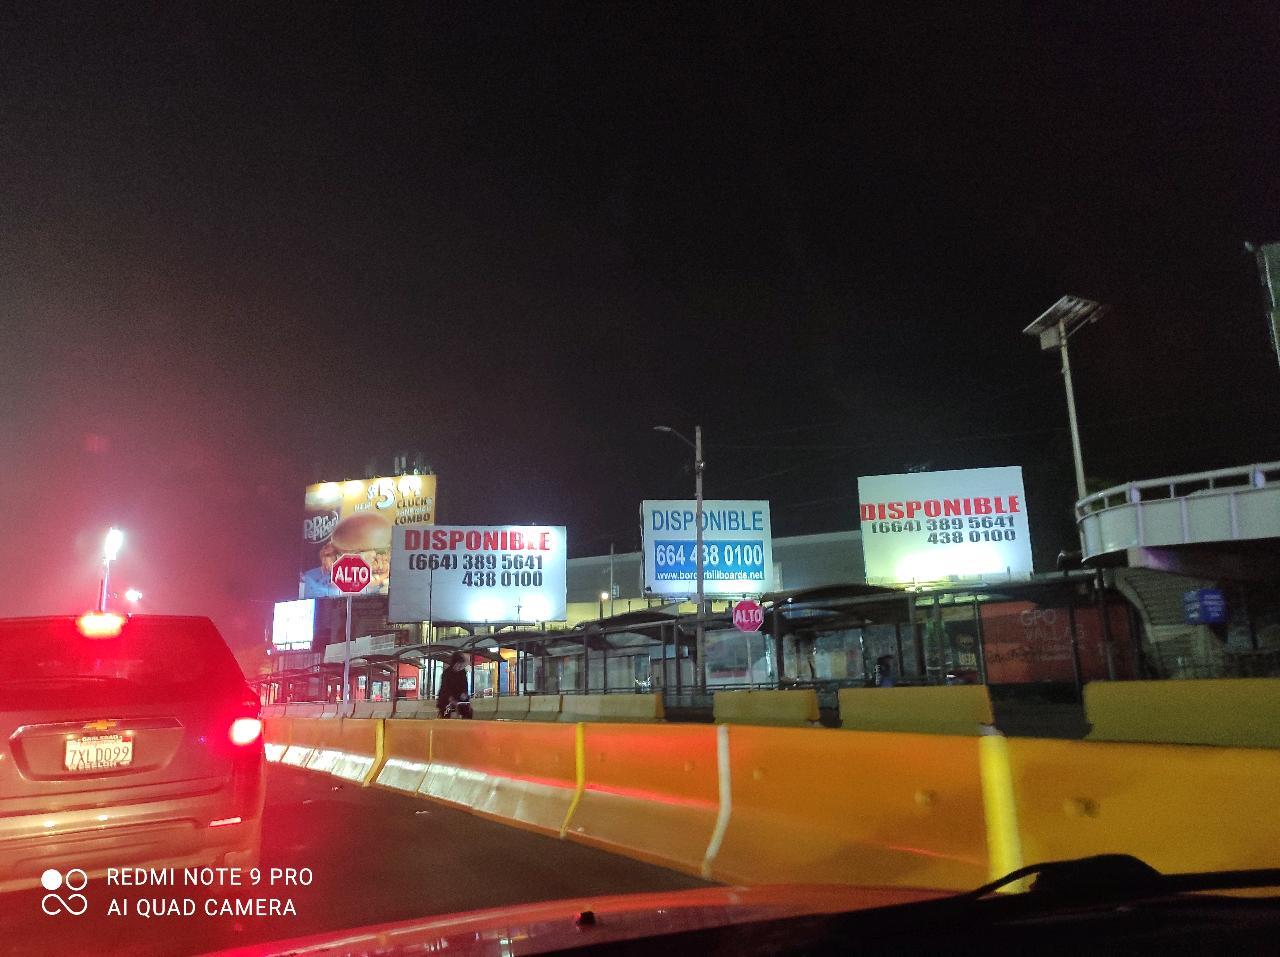 how long is San ysidro ready lane Tijuana #SanDiego border?